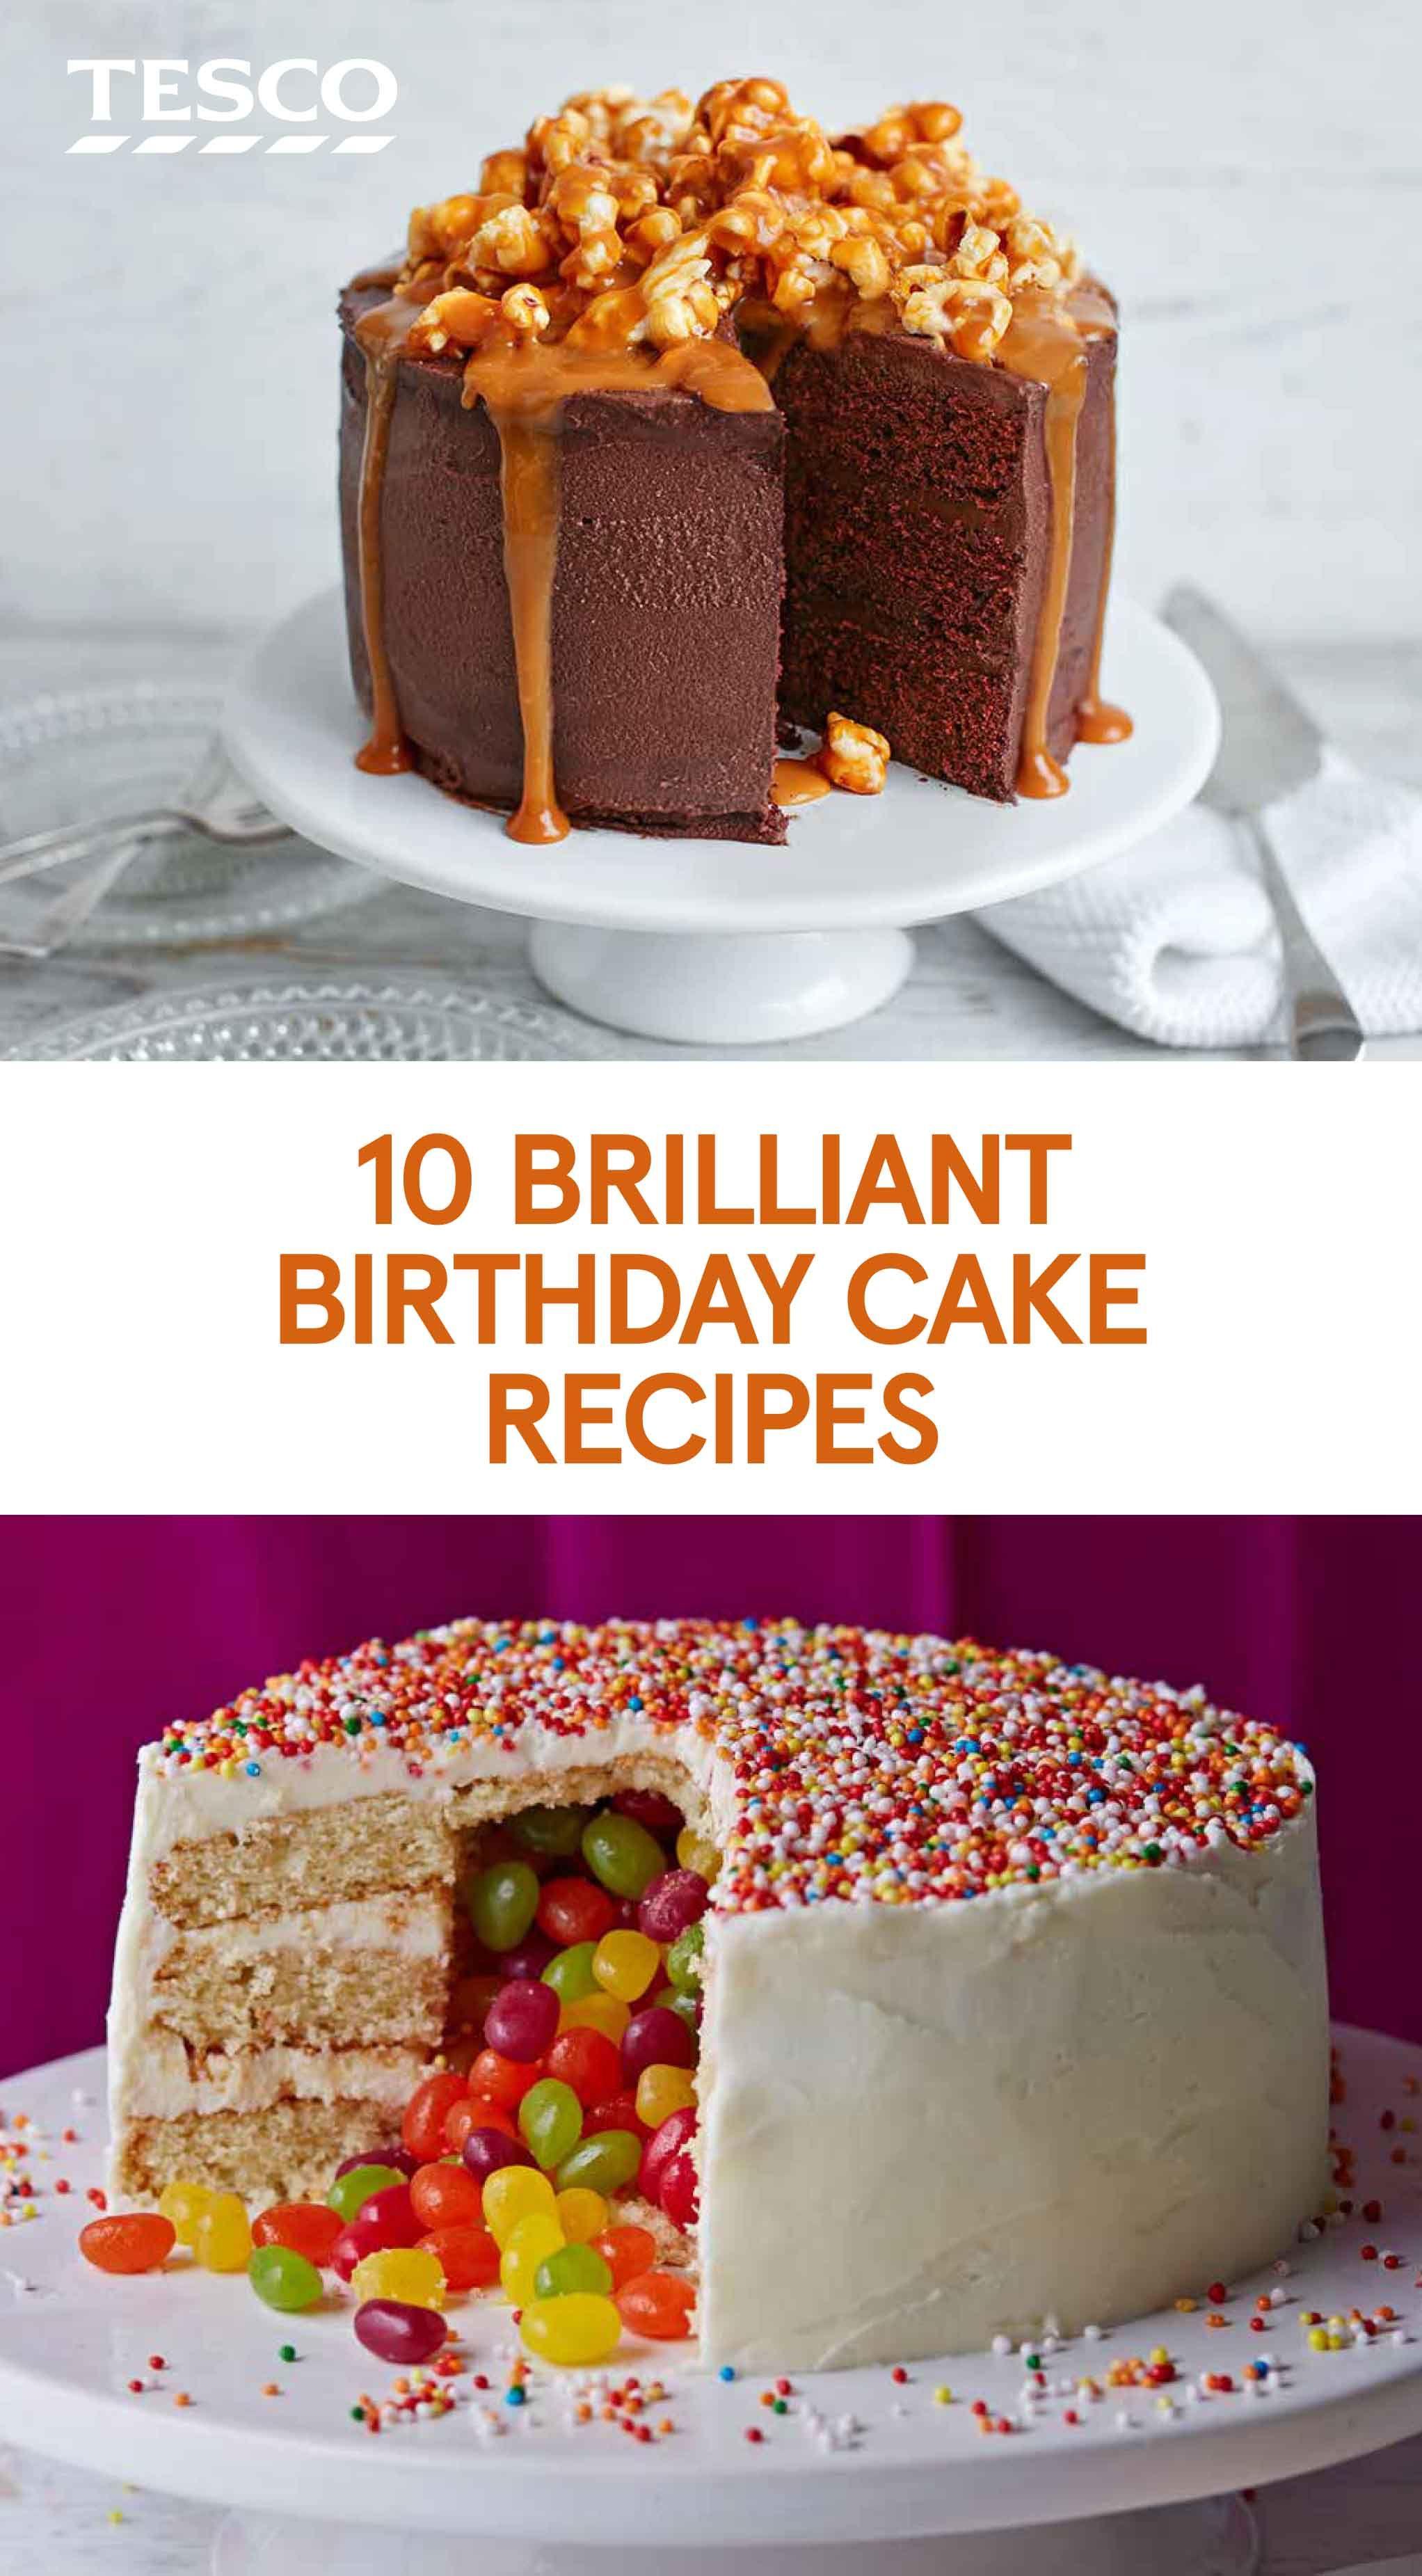 10 Brilliant Birthday Cake Recipes